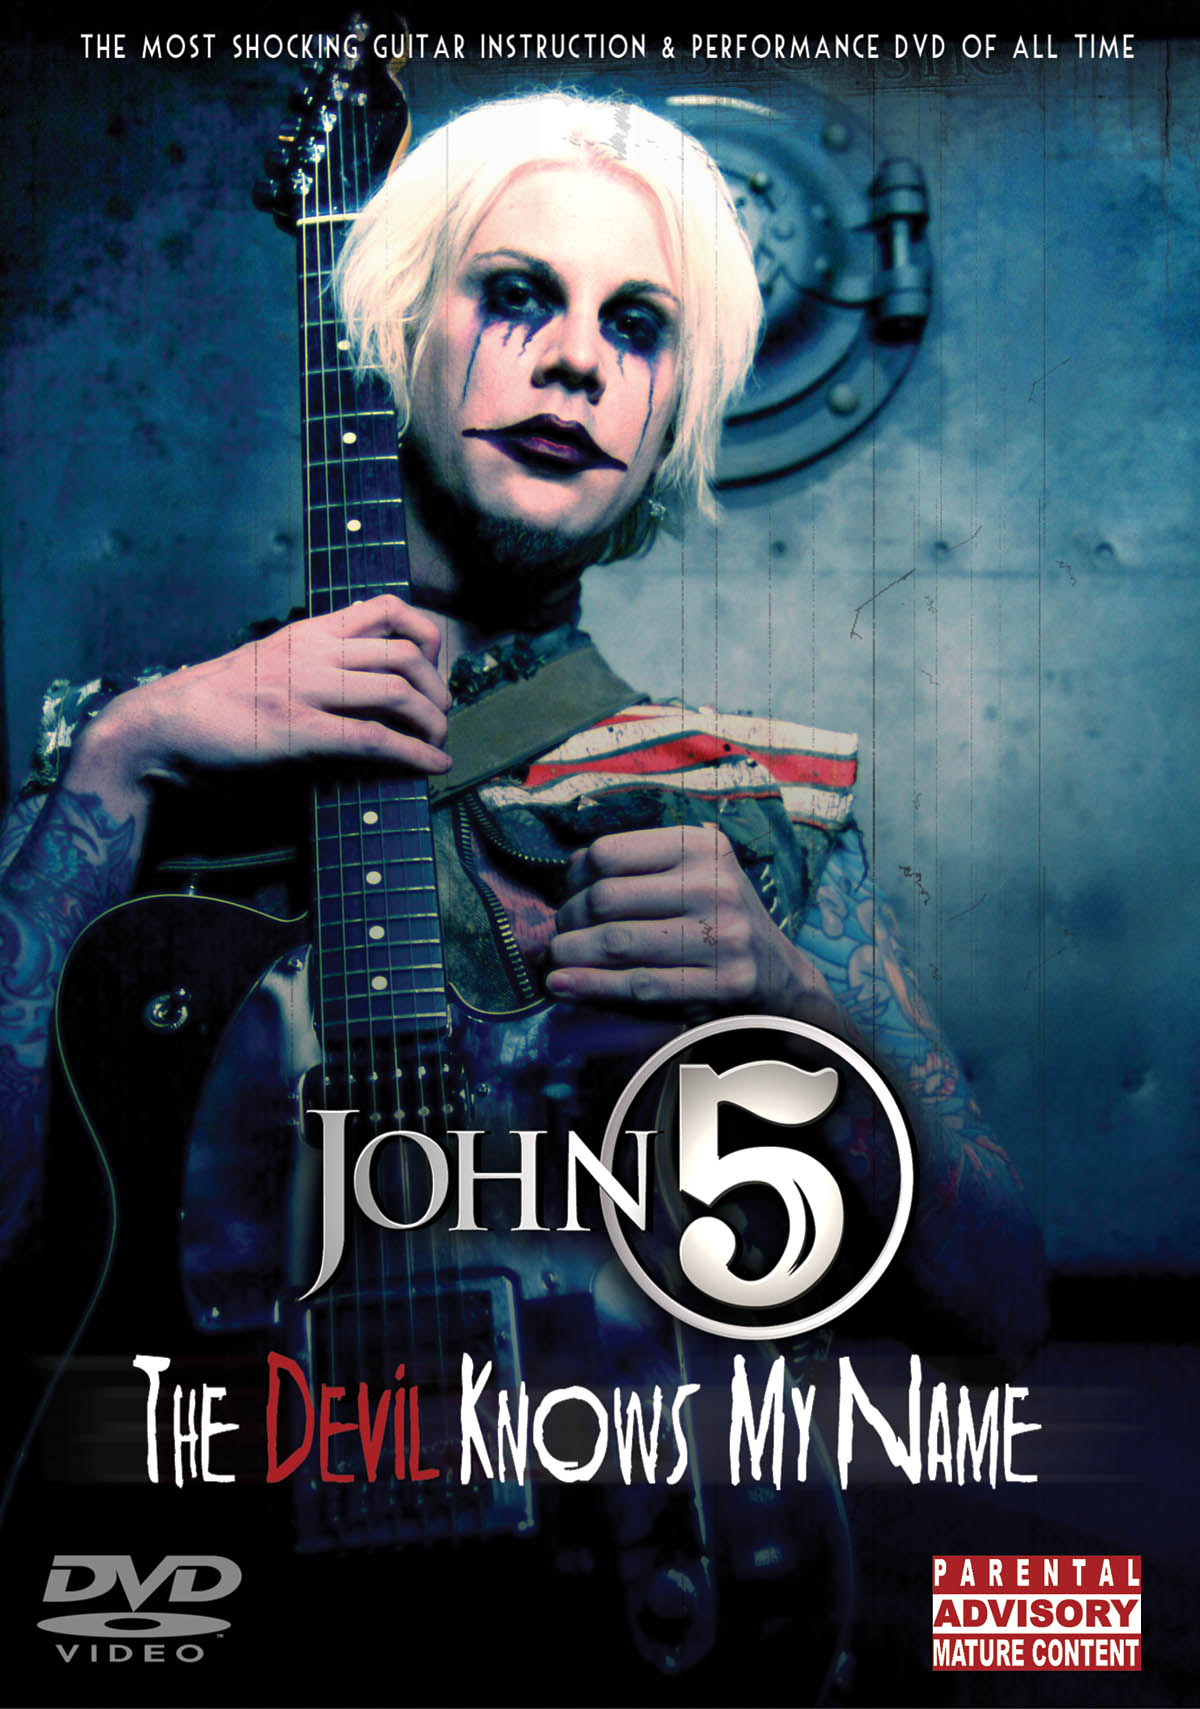 John 5: John 5 - The Devil Knows My Name: Guitar Solo: Instrumental Tutor